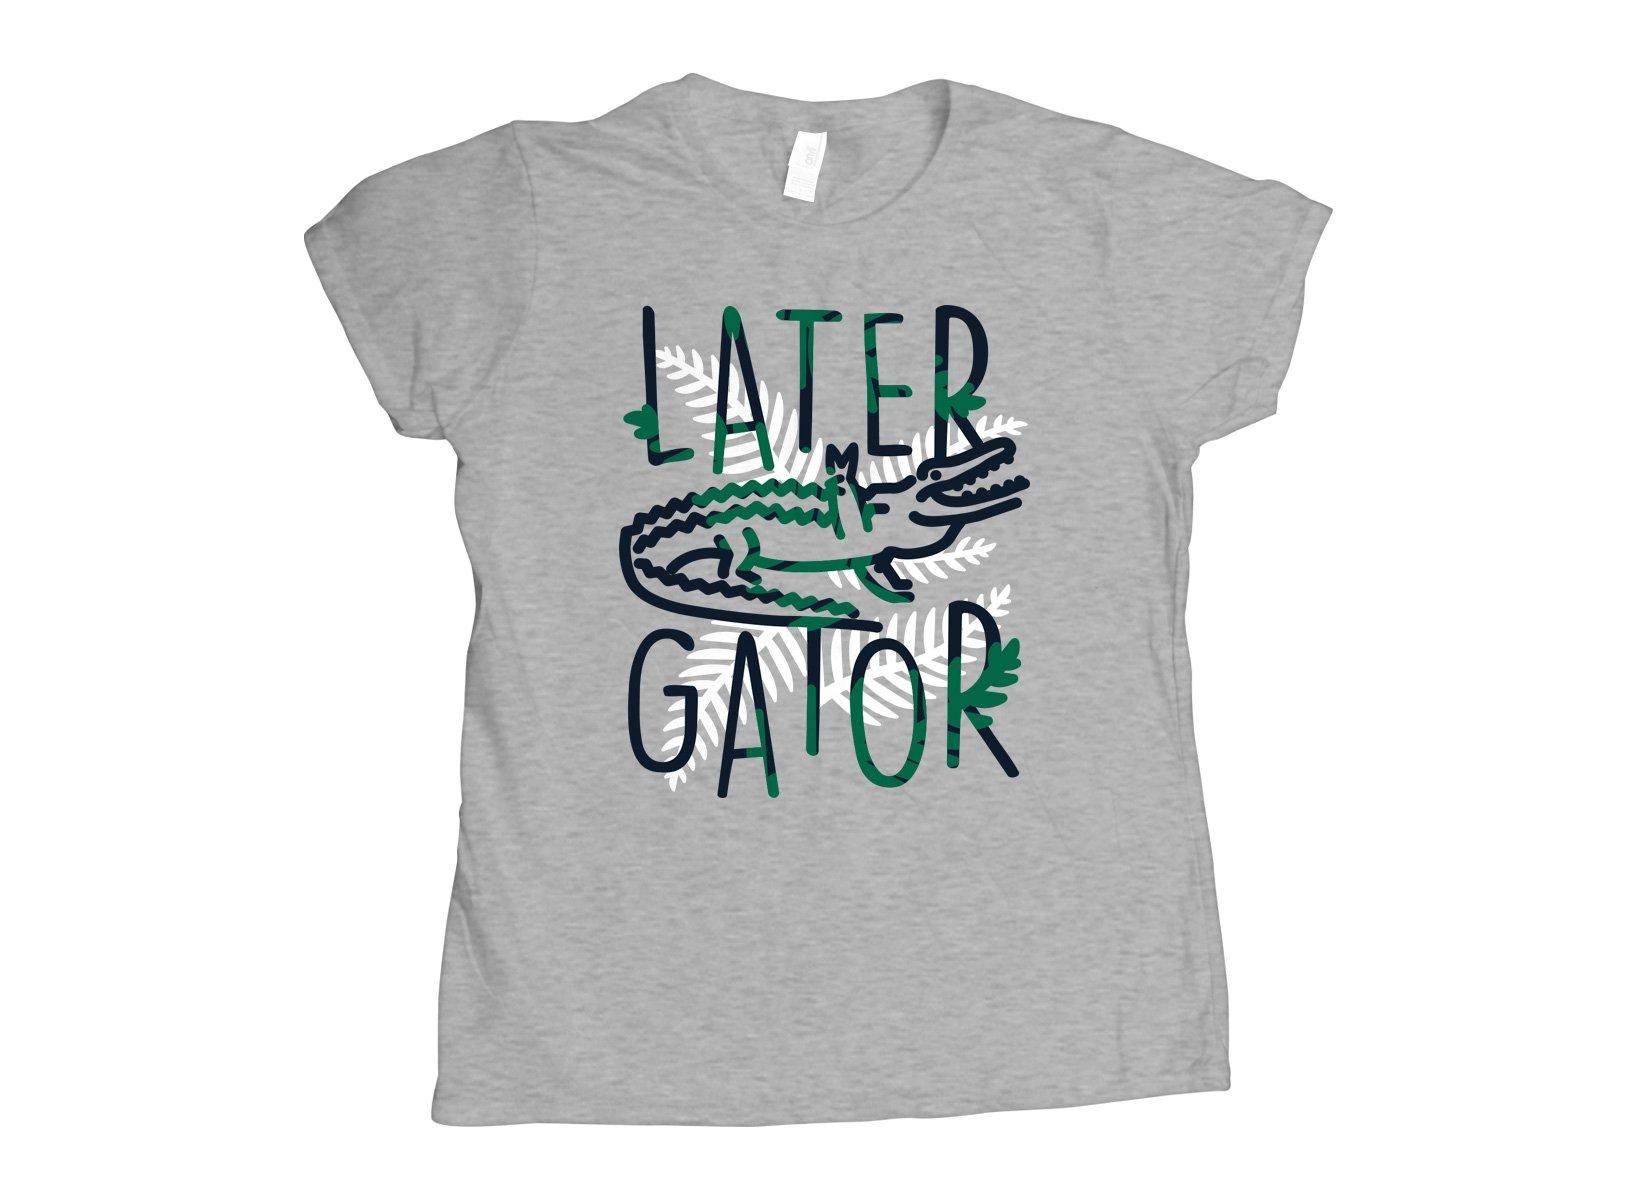 Later Gator on Womens T-Shirt